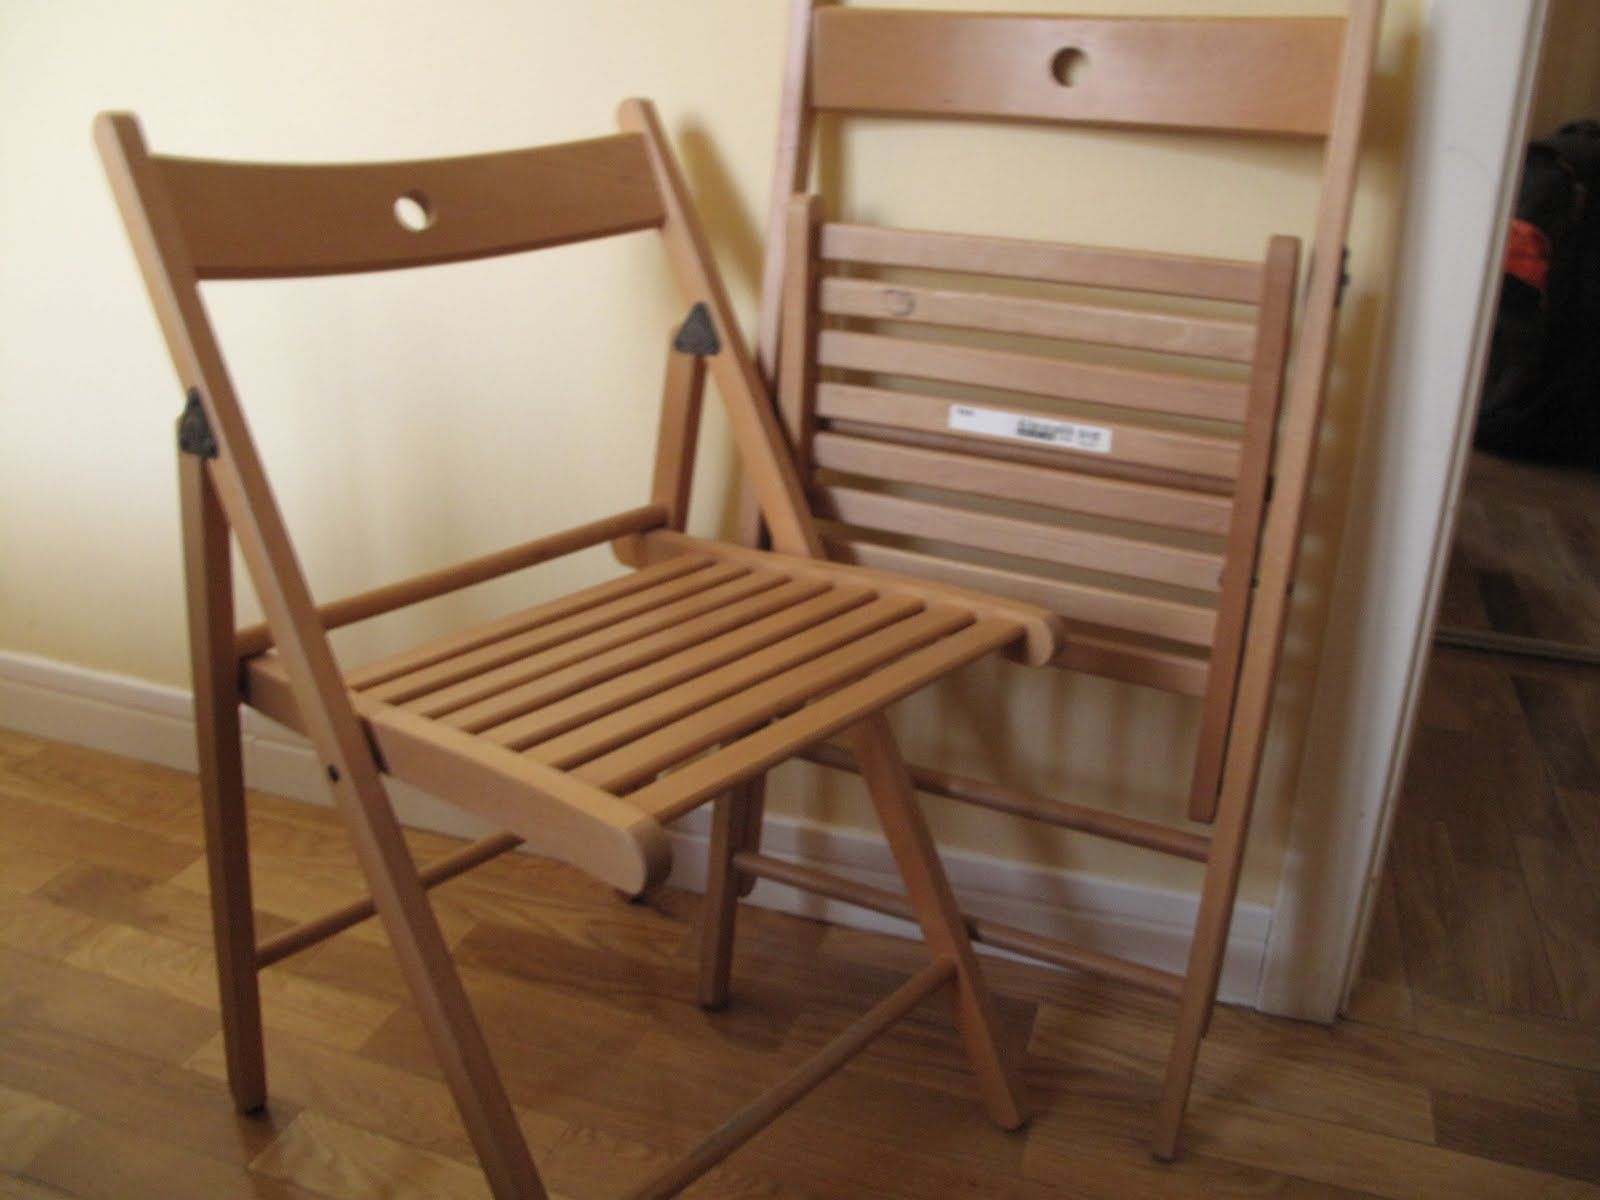 Venta de muebles en madrid sillas plegables for Sillas plegables ikea